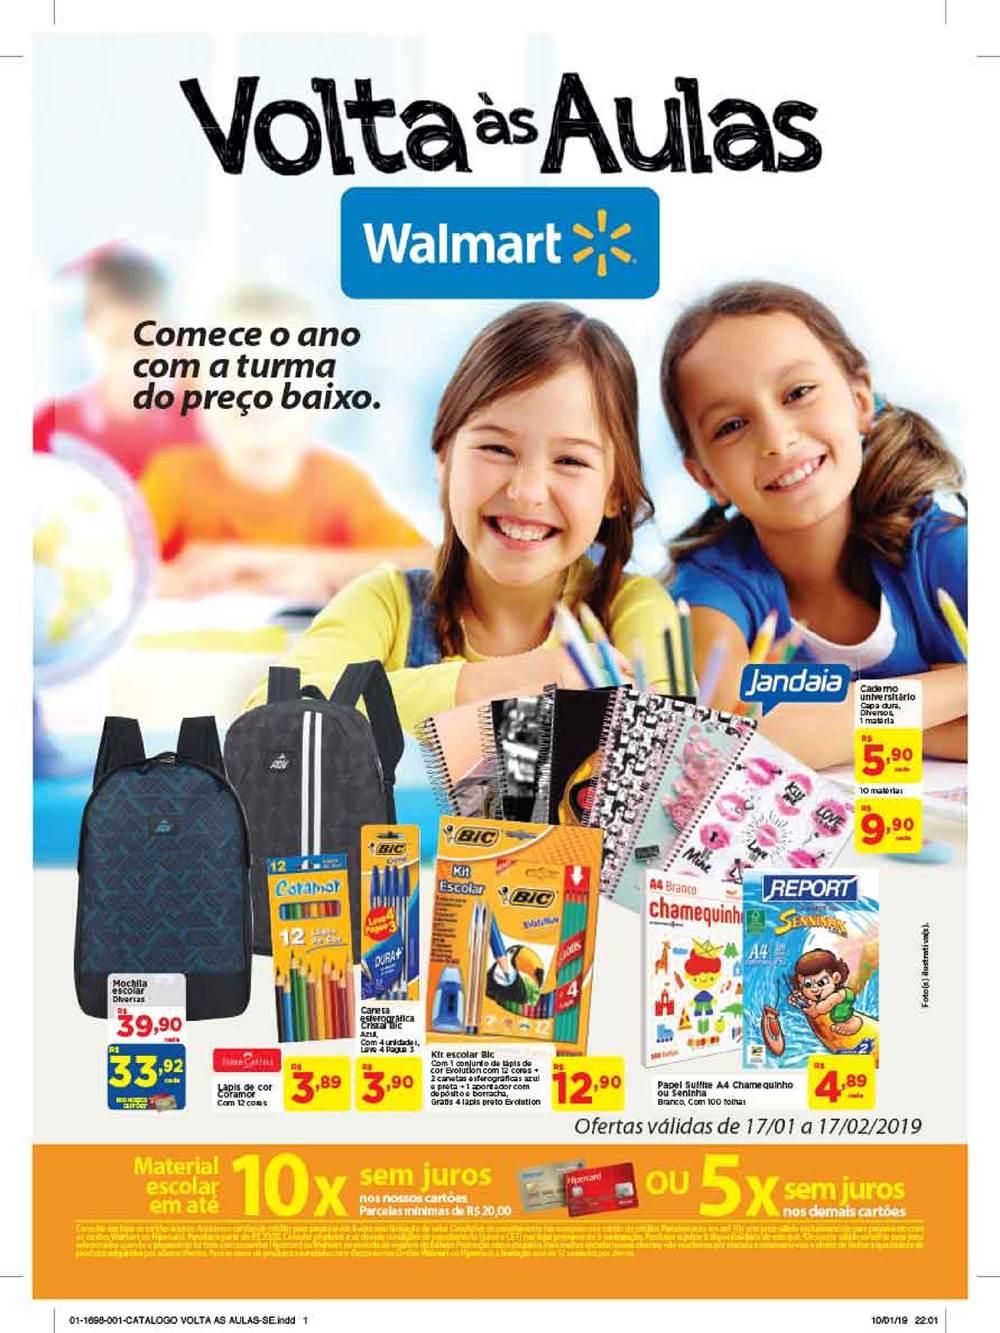 Ofertas-Walmart1-4 Ofertas de Supermercados - Economize!